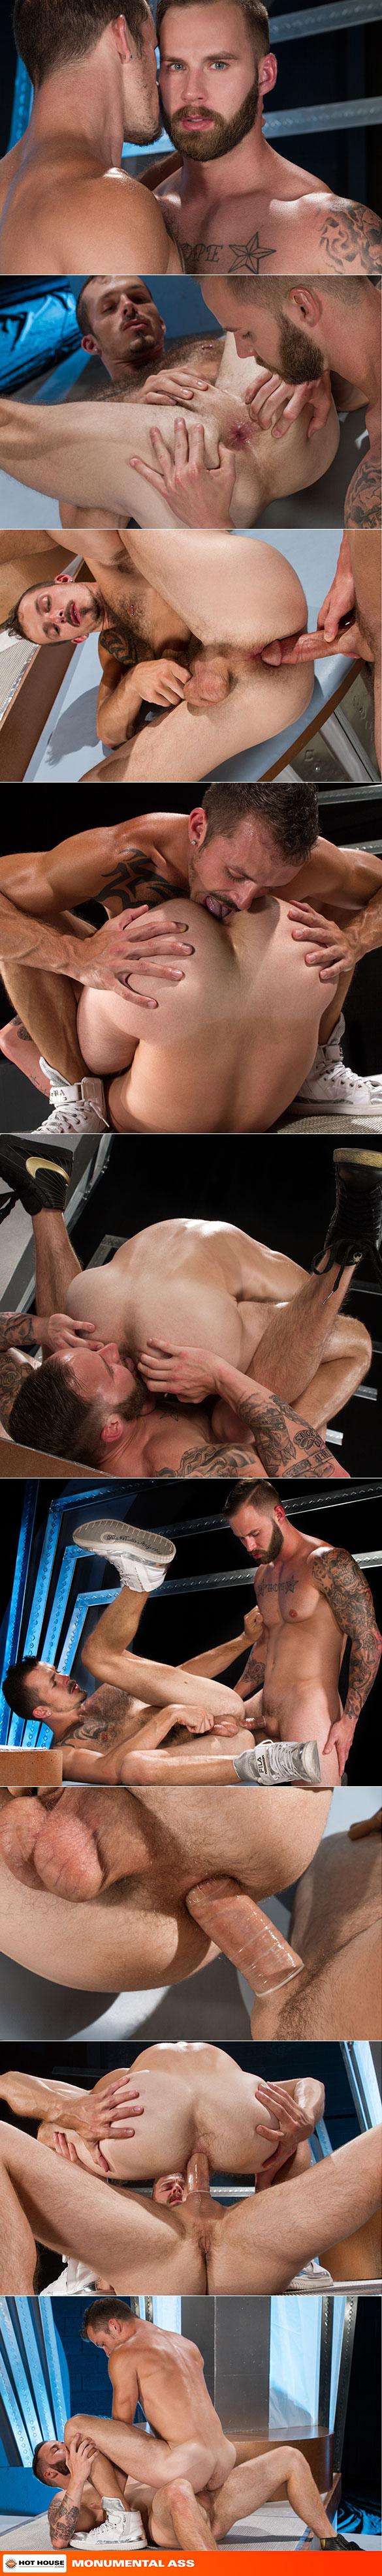 "NakedSword: Hot House Video's ""Monumental Ass"""